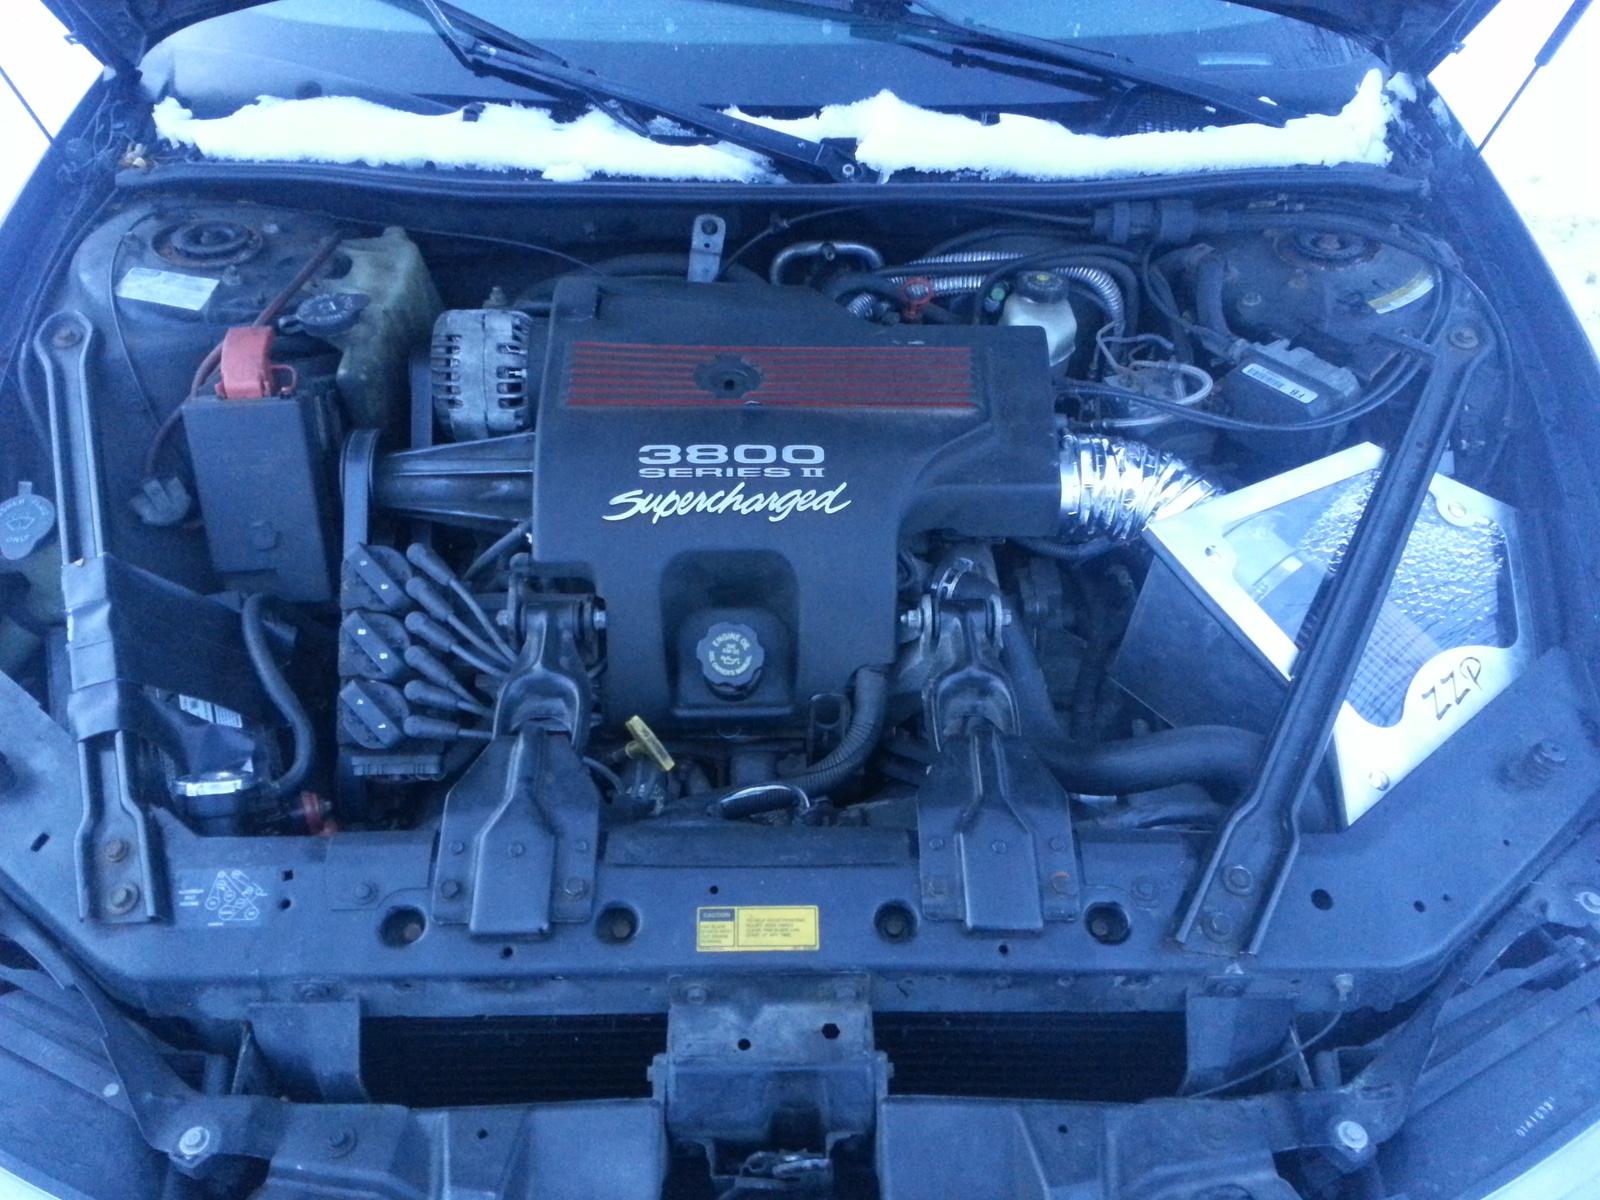 2003 pontiac grand prix engine diagram diagrams of isotonic hypotonic and hypertonic solutions am 3400 v6 camaro 3 4